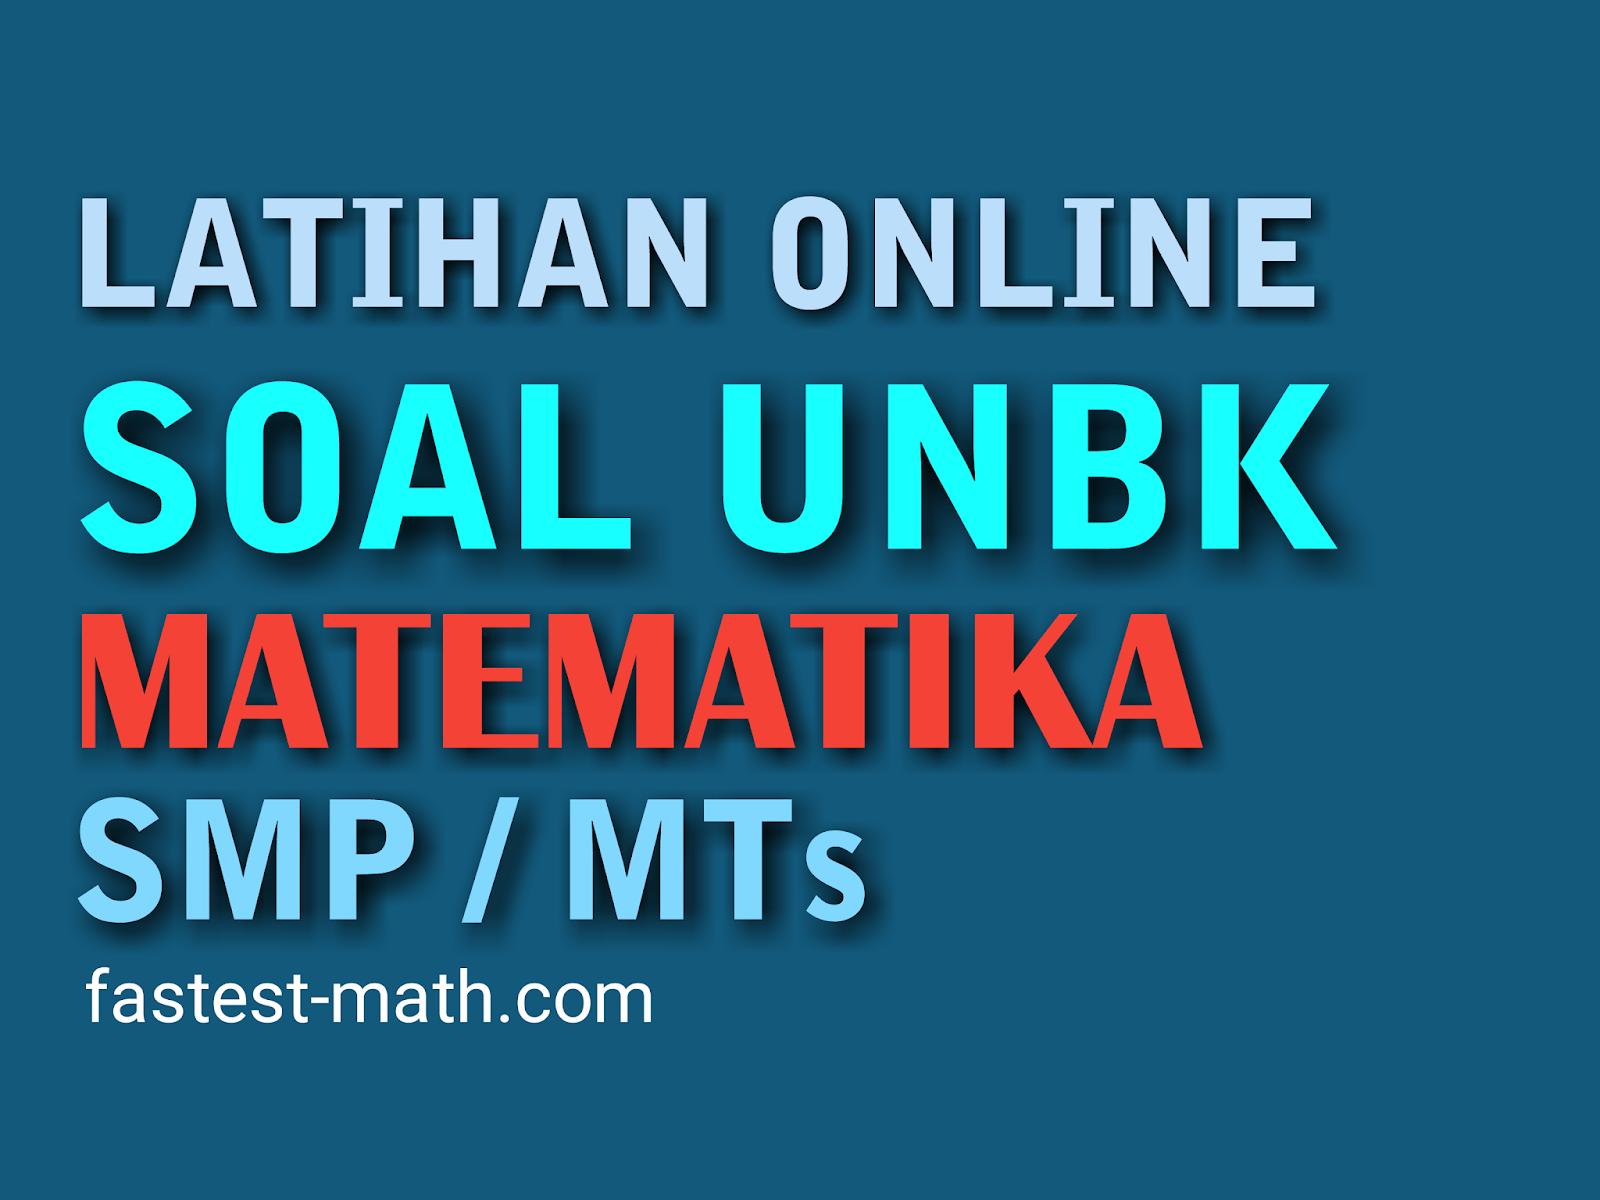 Latihan Soal Unbk Matematika Smp Mts Tahun 2020 Paket 2 Fastest Math